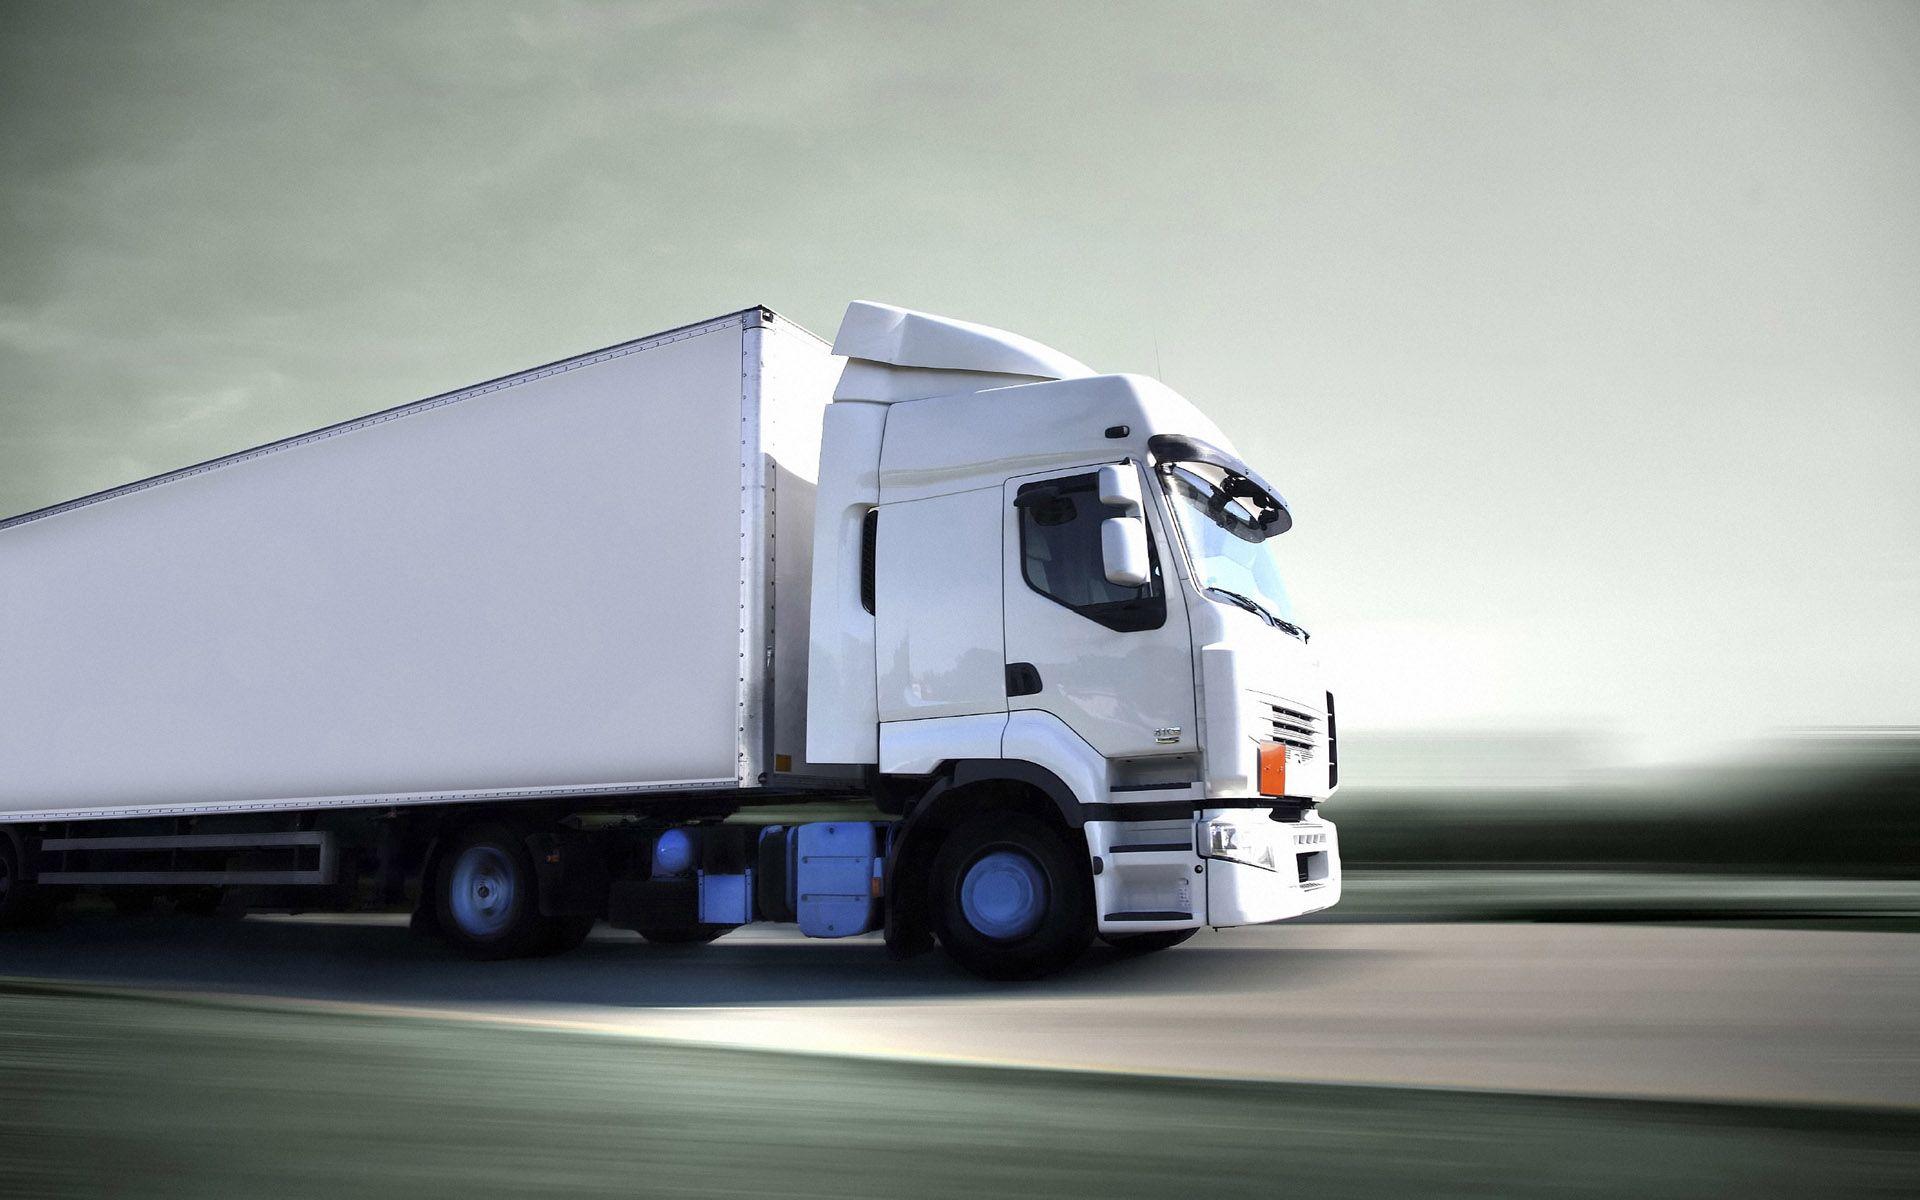 7a79a600bfdfd8a8819613d7b245f717 - Curso de Capacitación para el Transporte